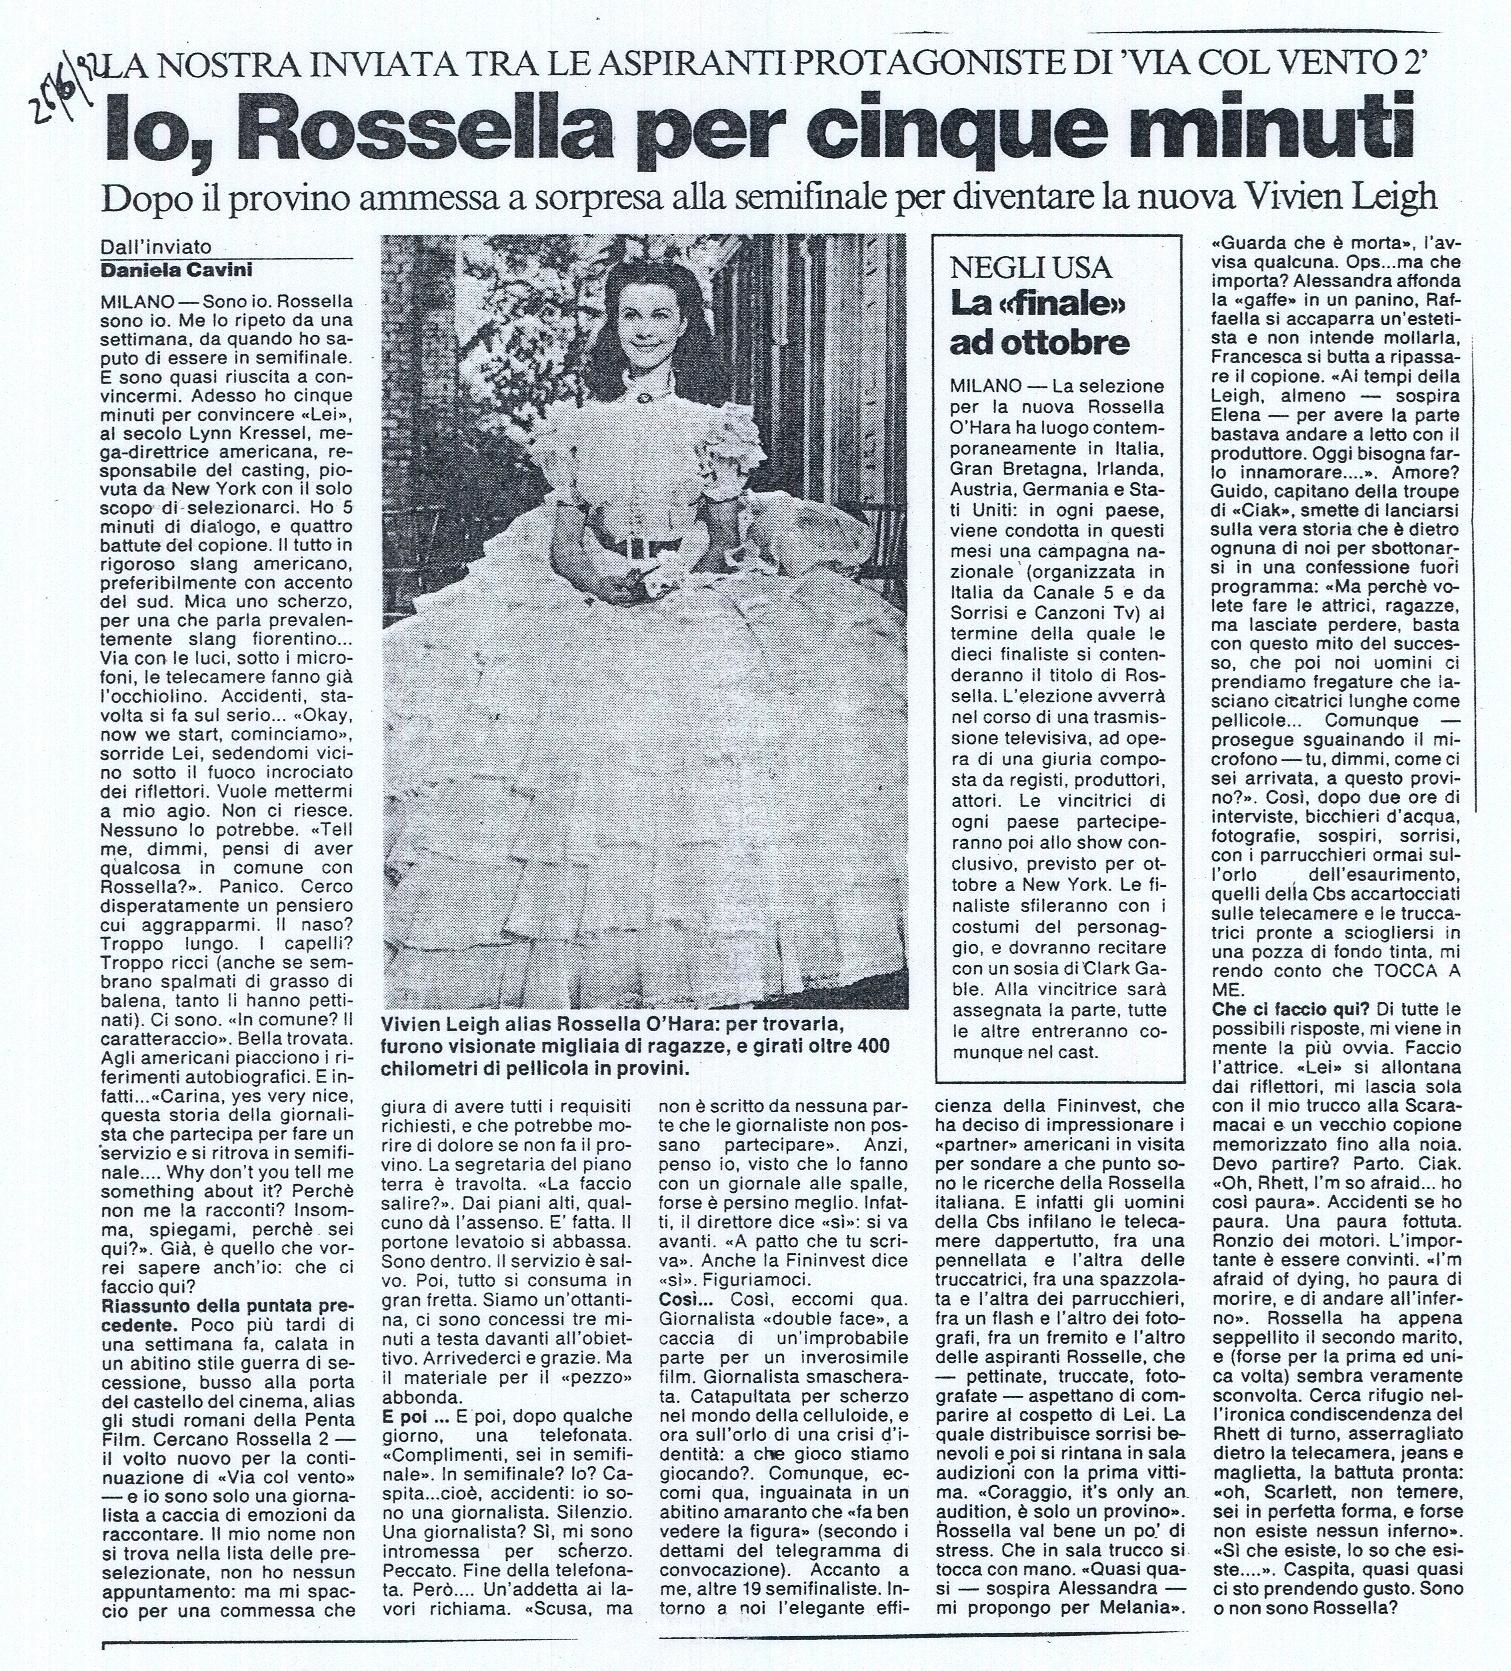 Io, Rossella per cinque minuti  06-92